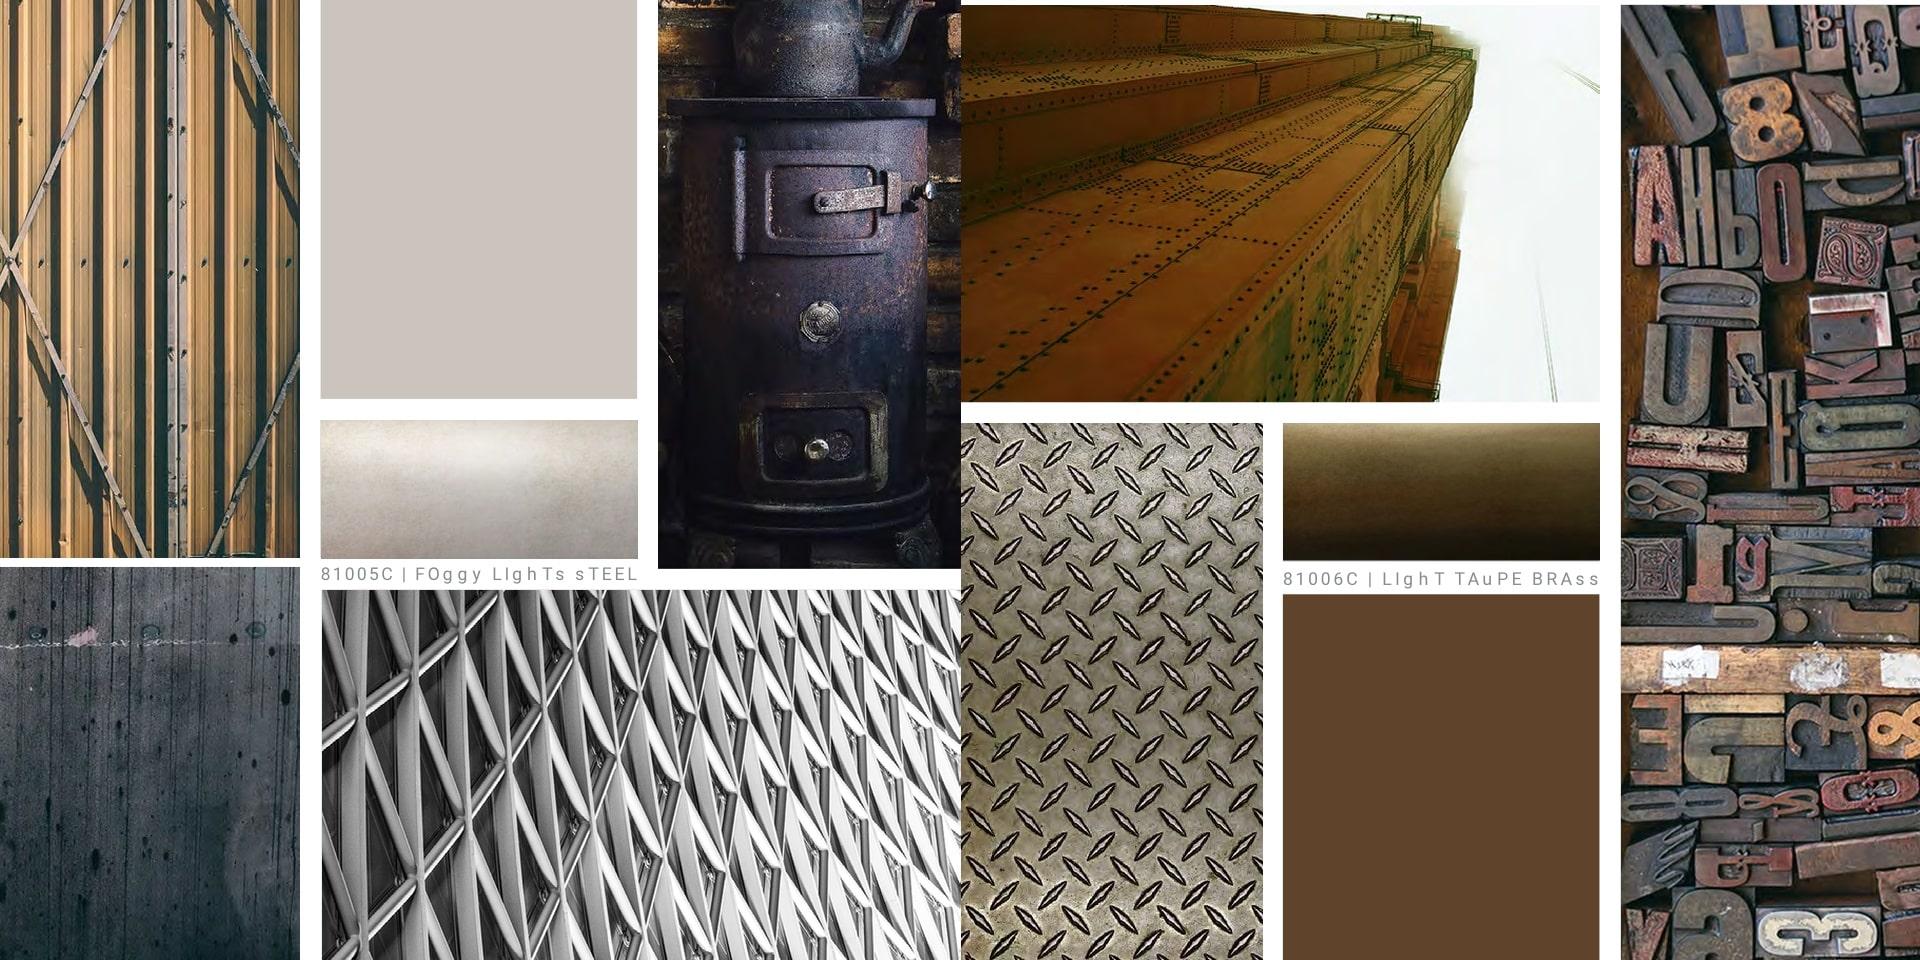 Variazioni Metalliche catalog